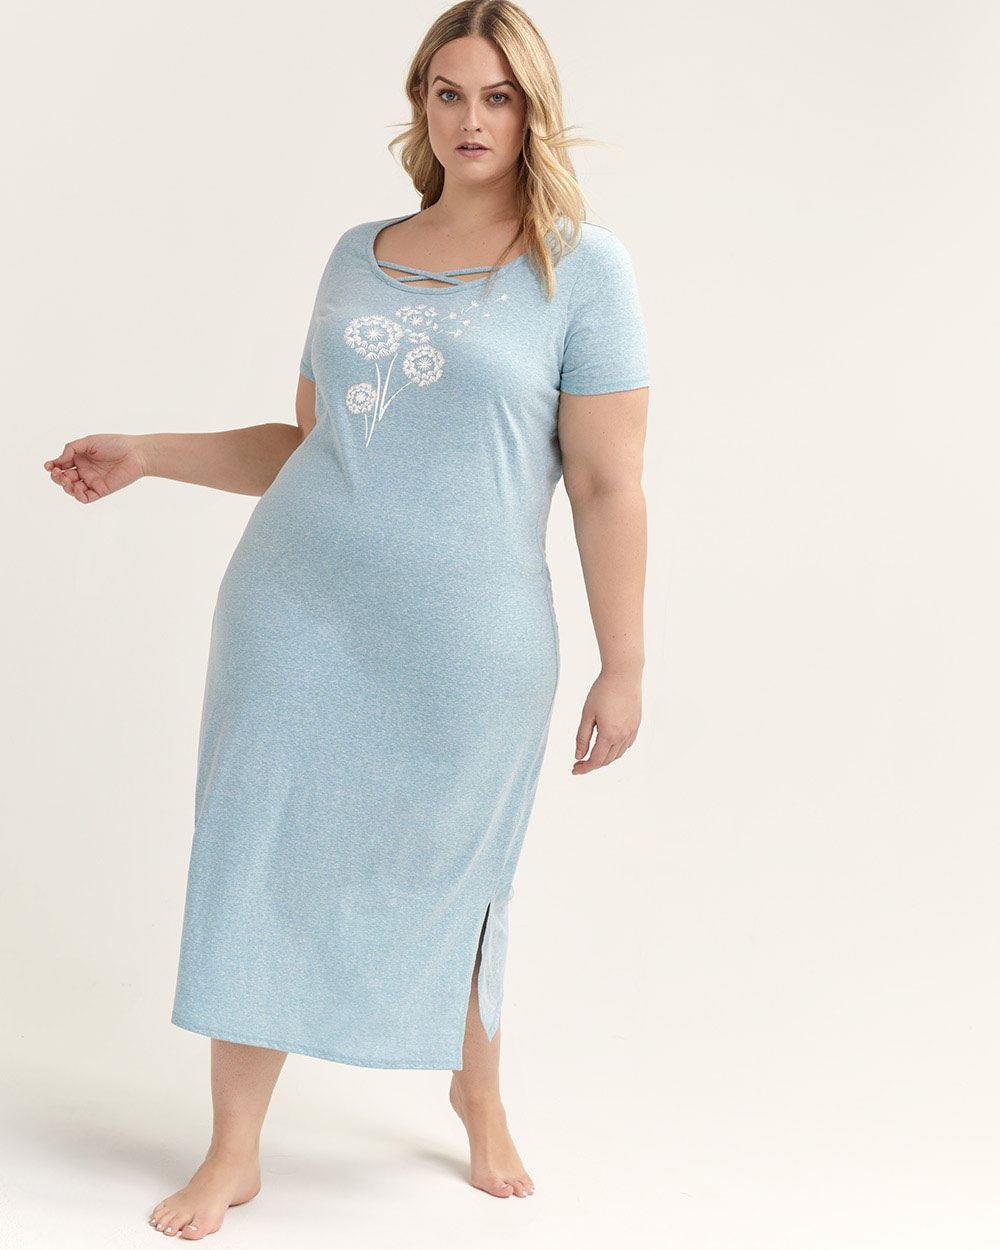 e8546d987 Lyst - Addition Elle Printed Cotton Long Sleepshirt - Ti Voglio in Blue